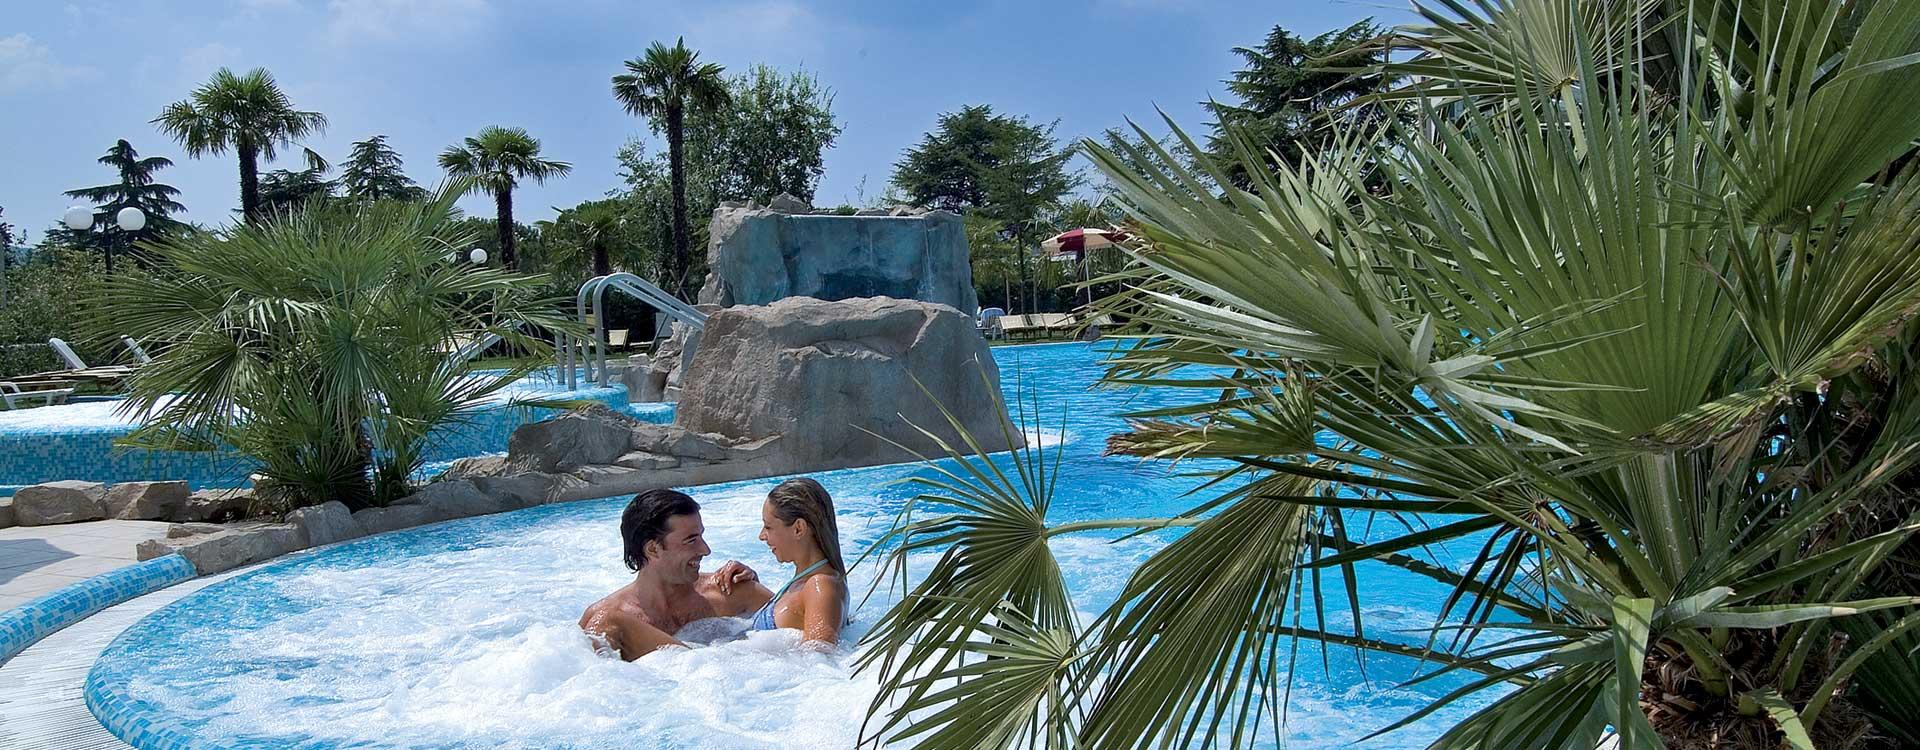 Hotel Terme All\'Alba - SPA Hotel 4 stars - Abano Terme